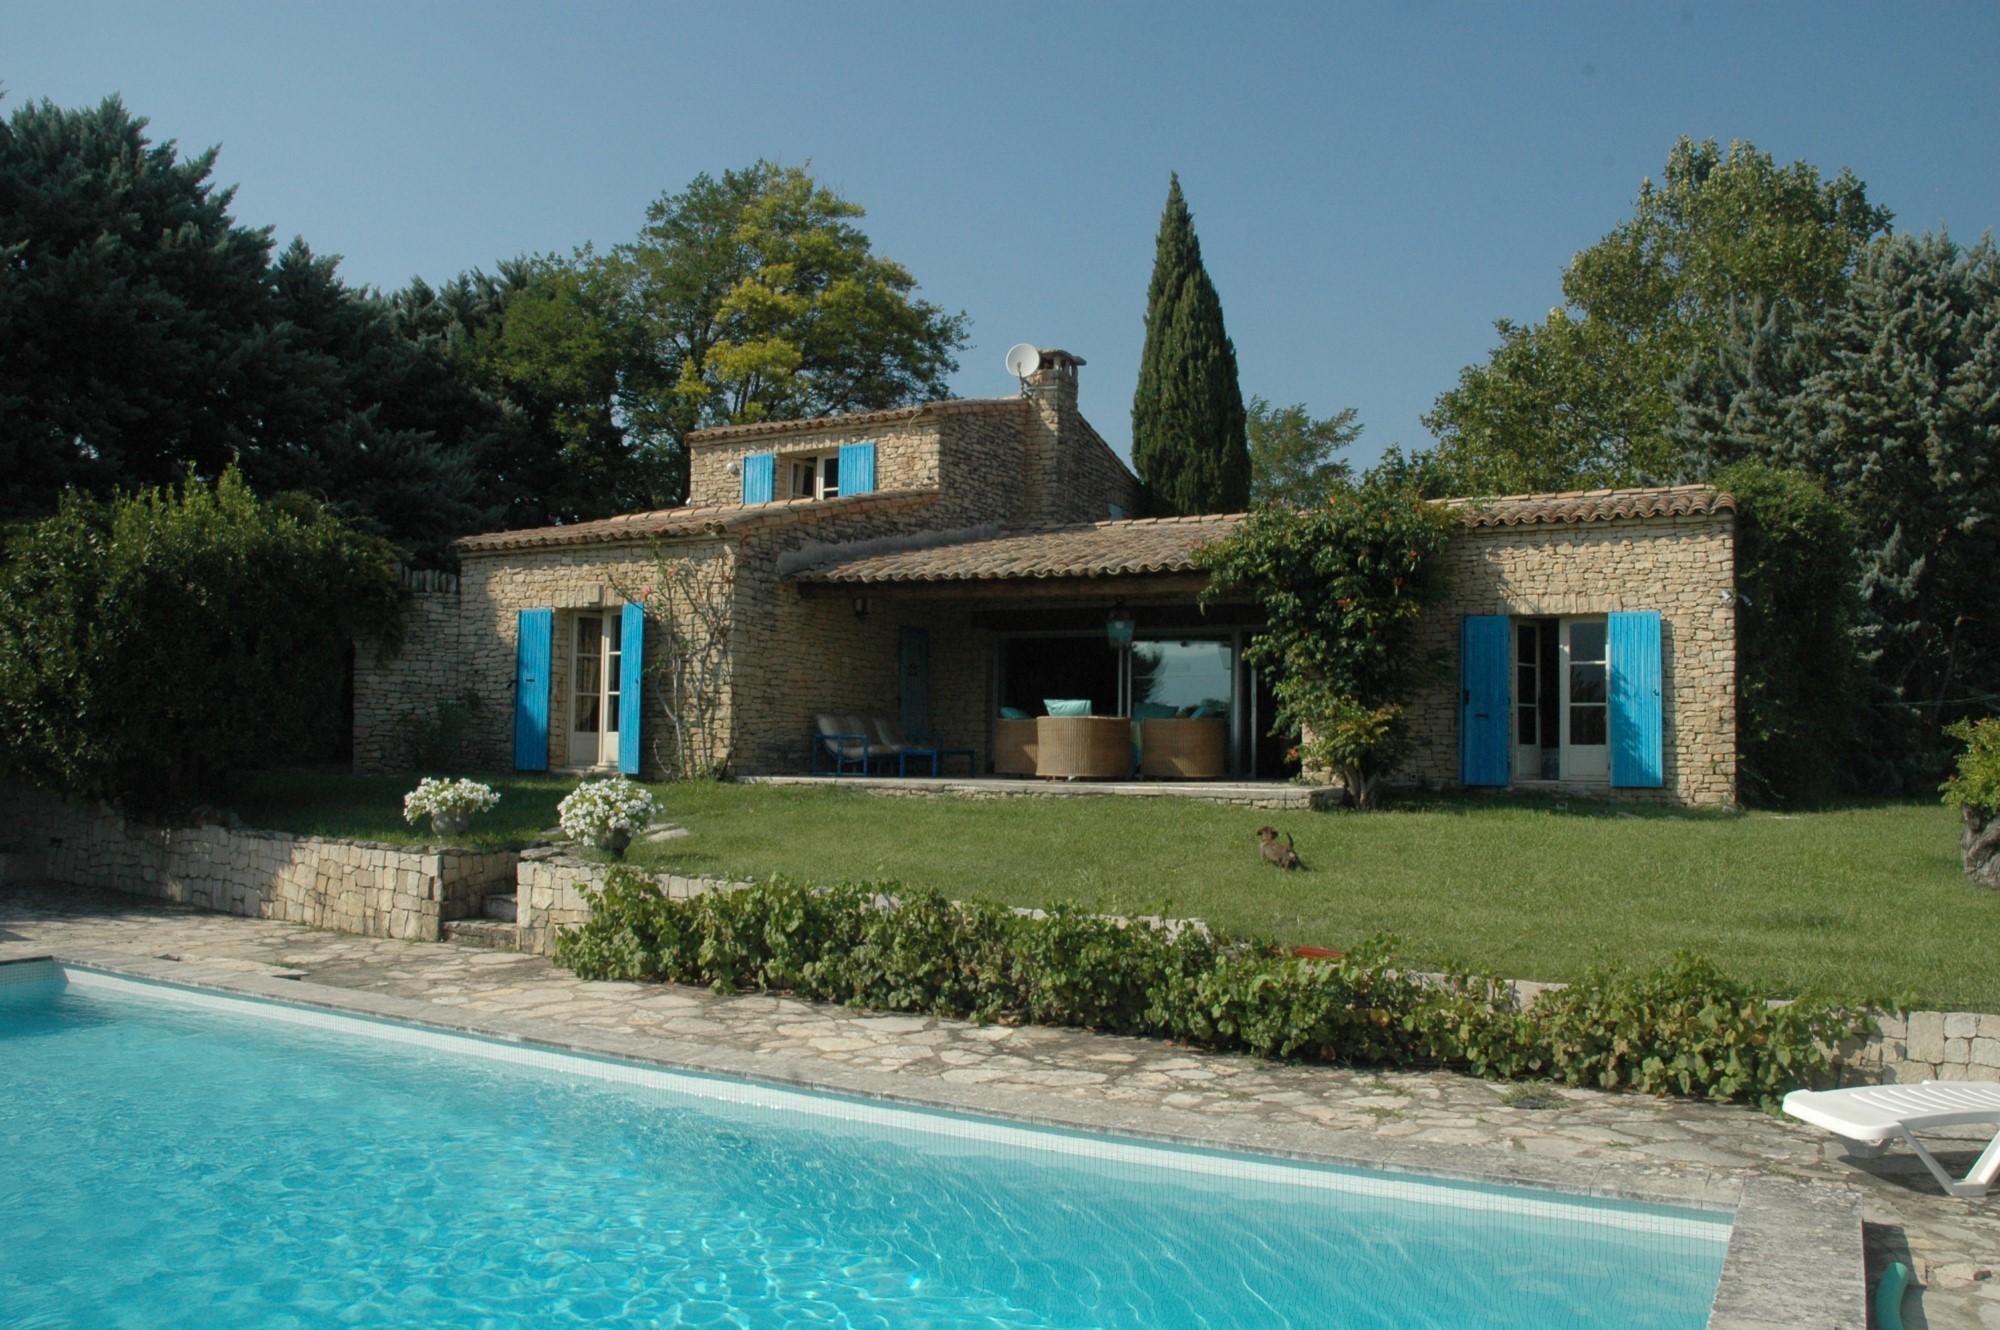 Ventes villa en pierres dans le luberon avec jardin for Vente tuyau piscine